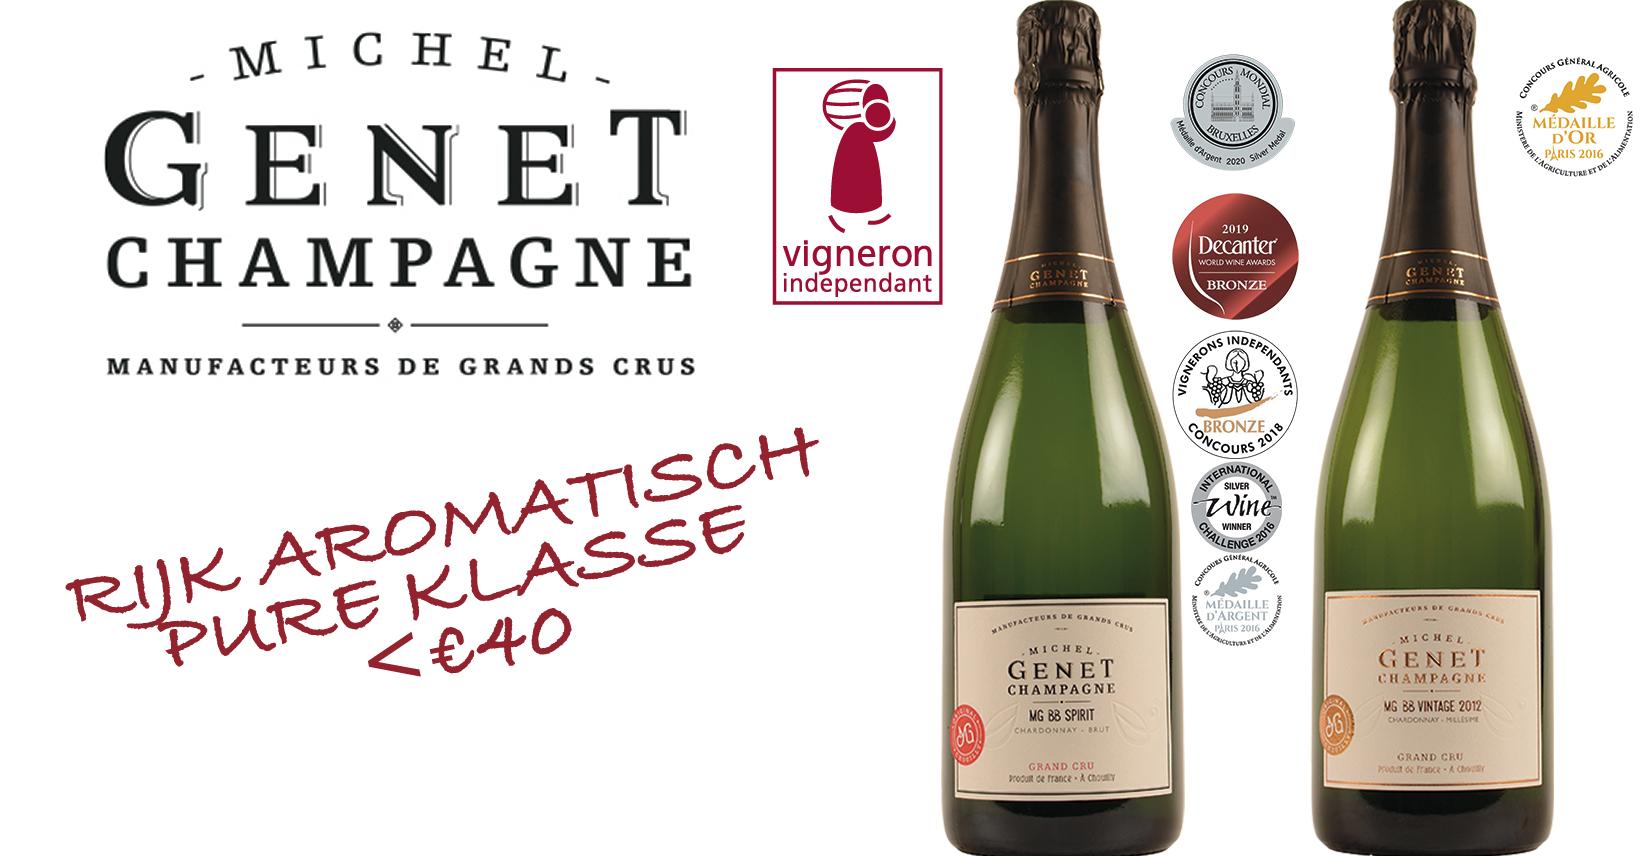 Champagne Michel Genet Frankrijk promo